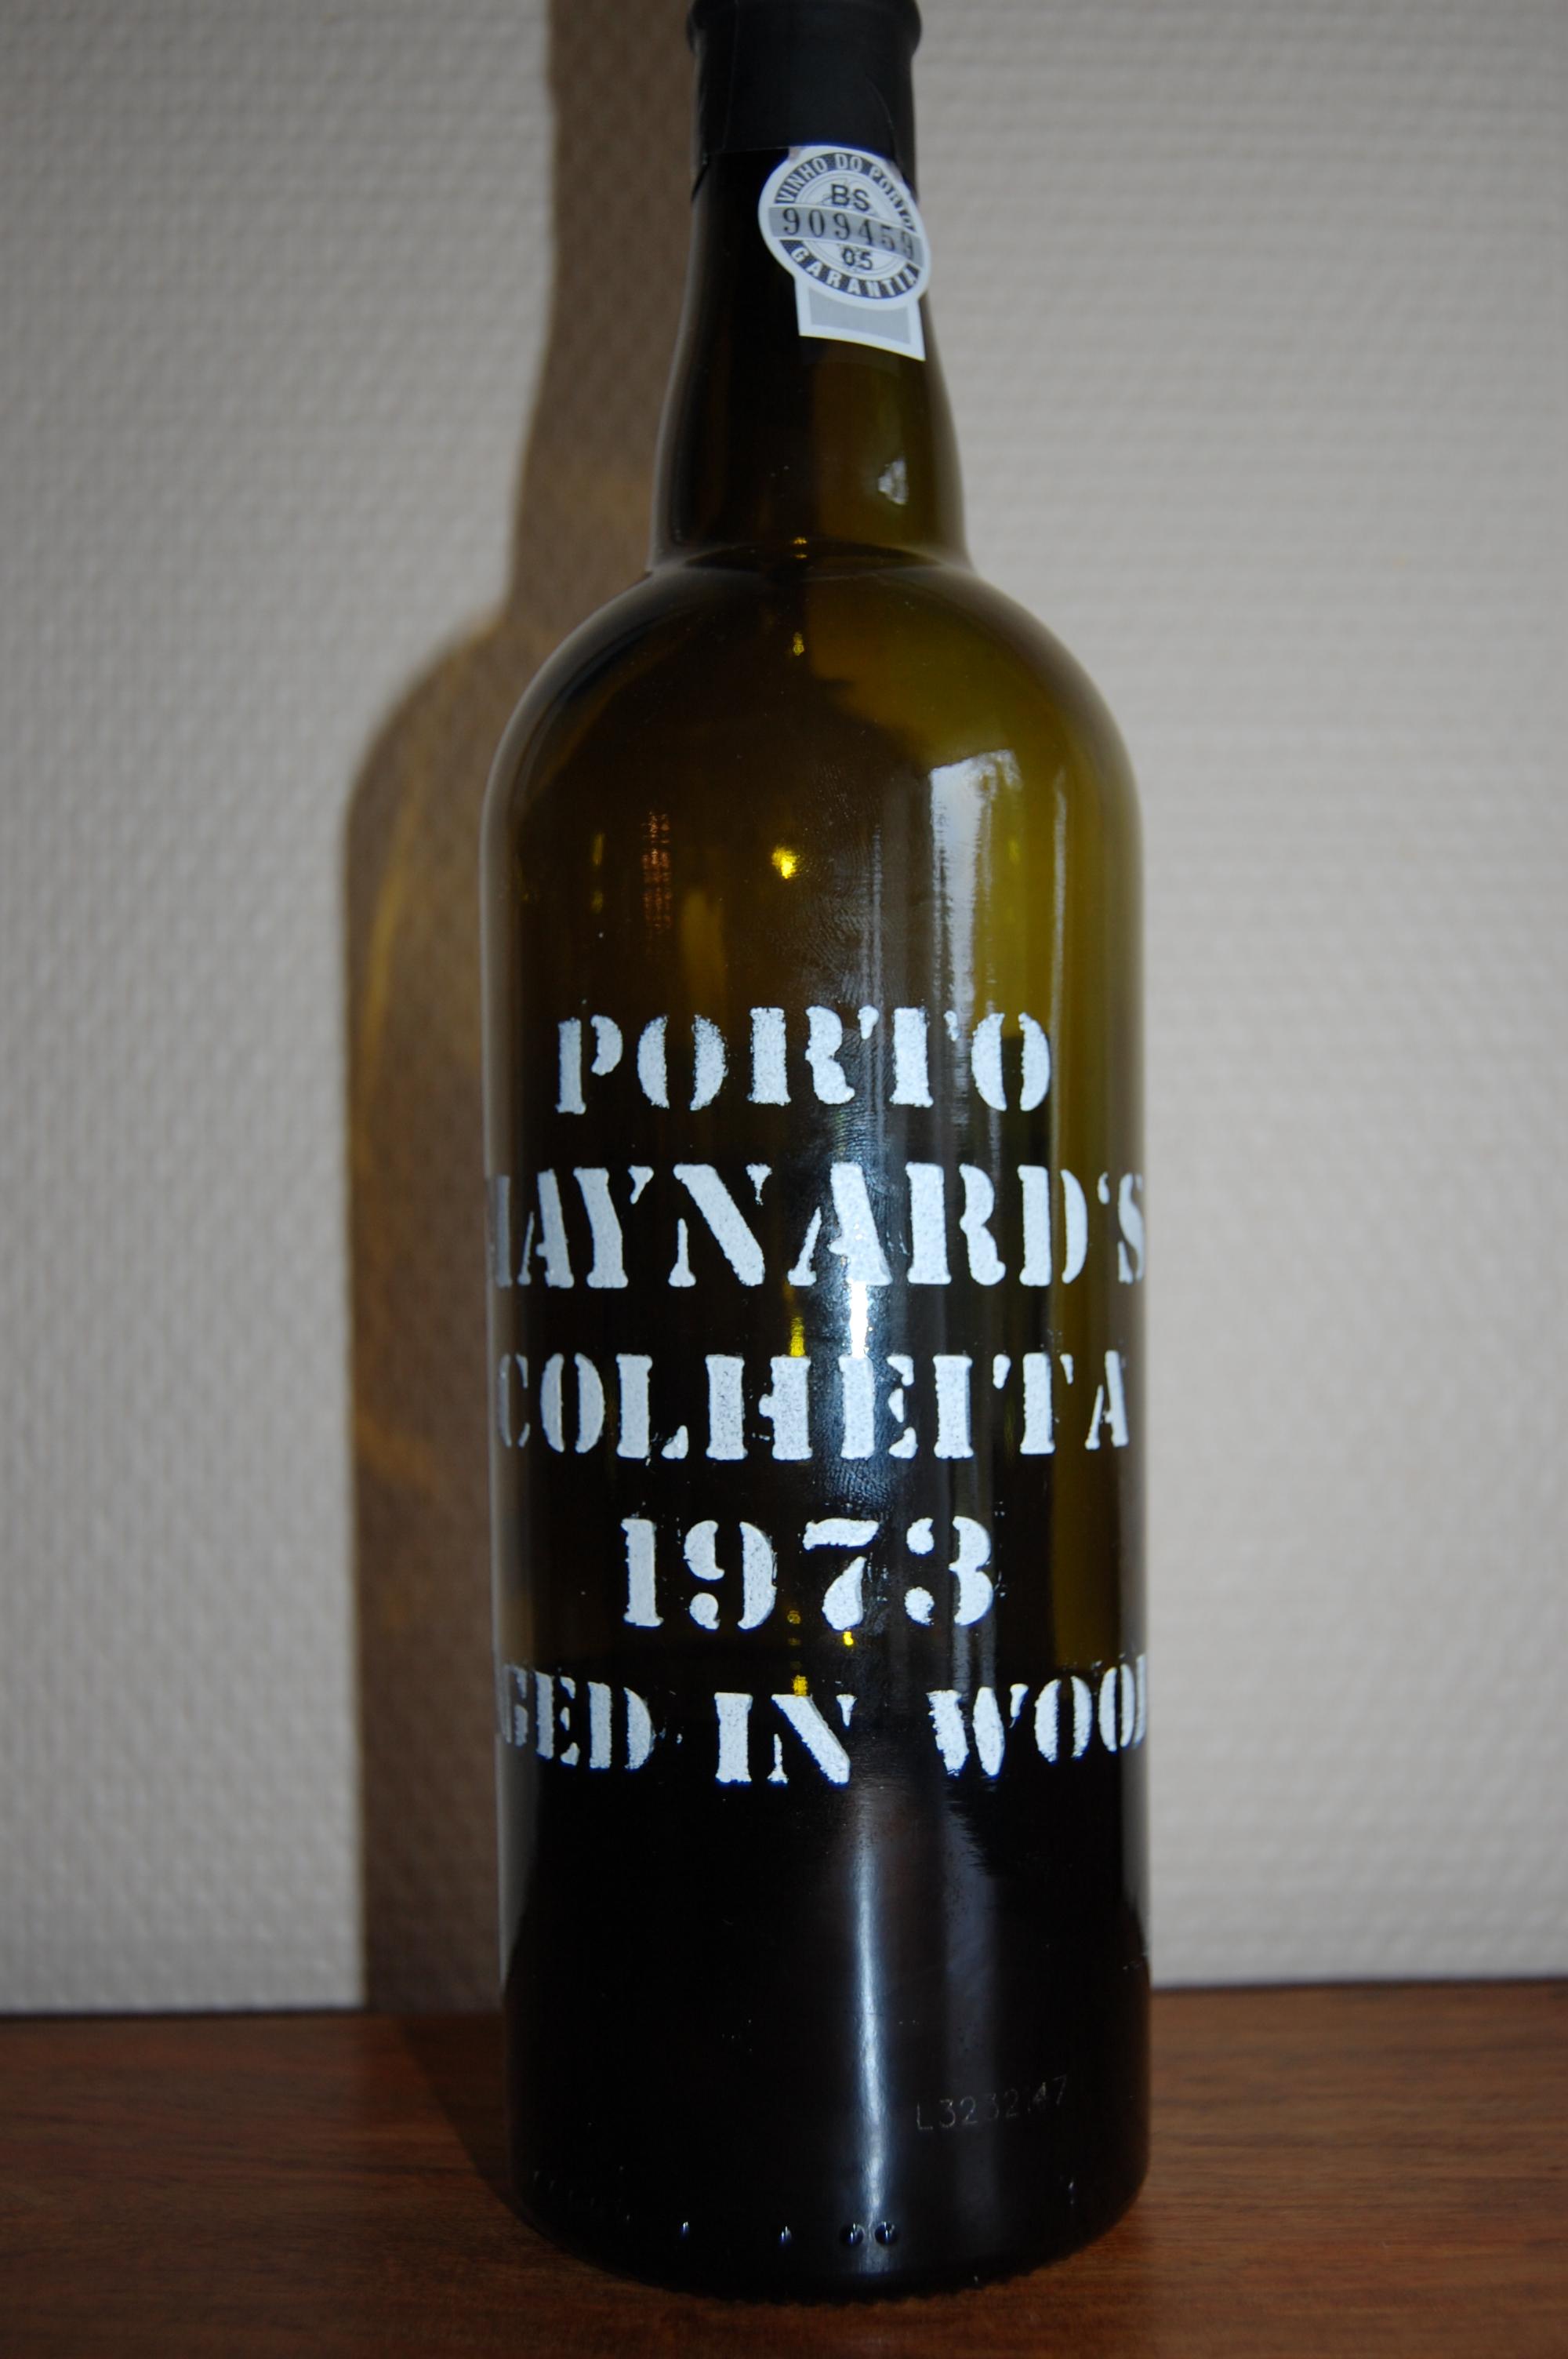 Maynards col. 73